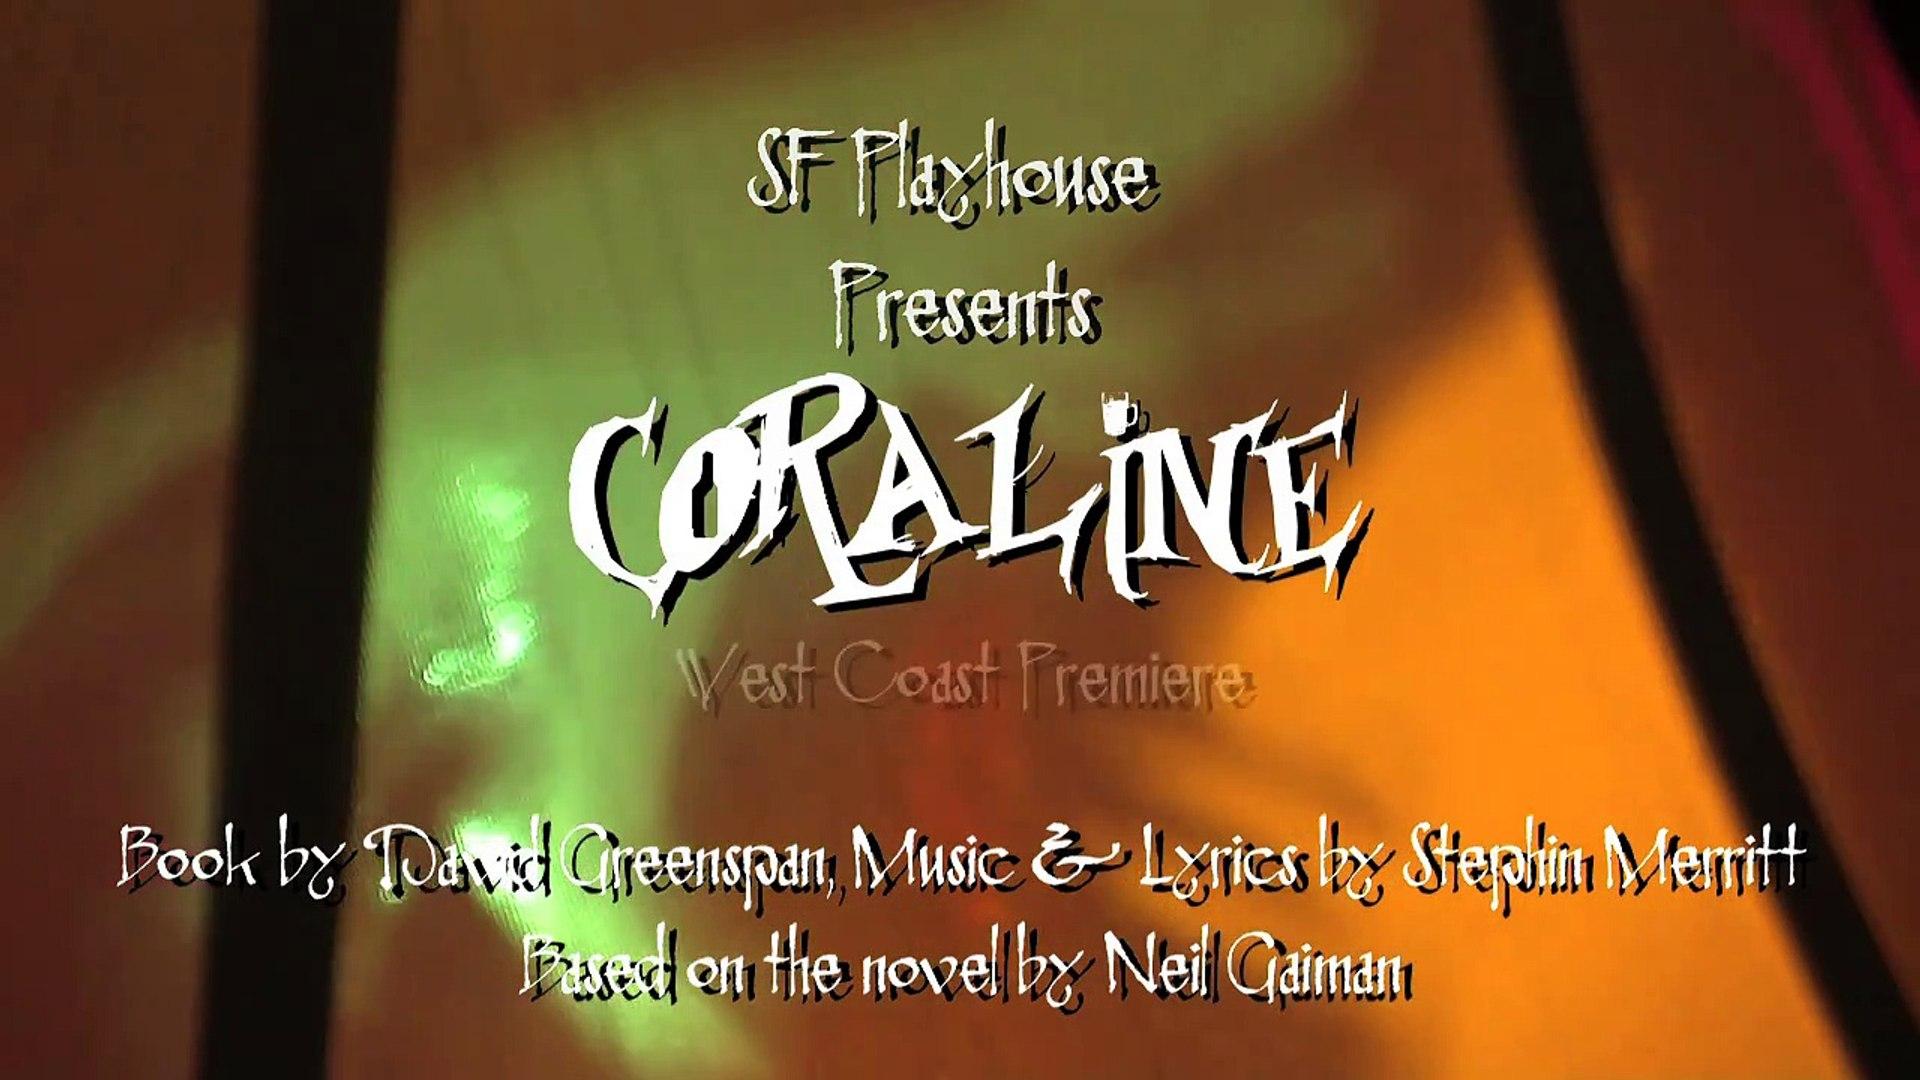 Behind the Scenes of Coraline